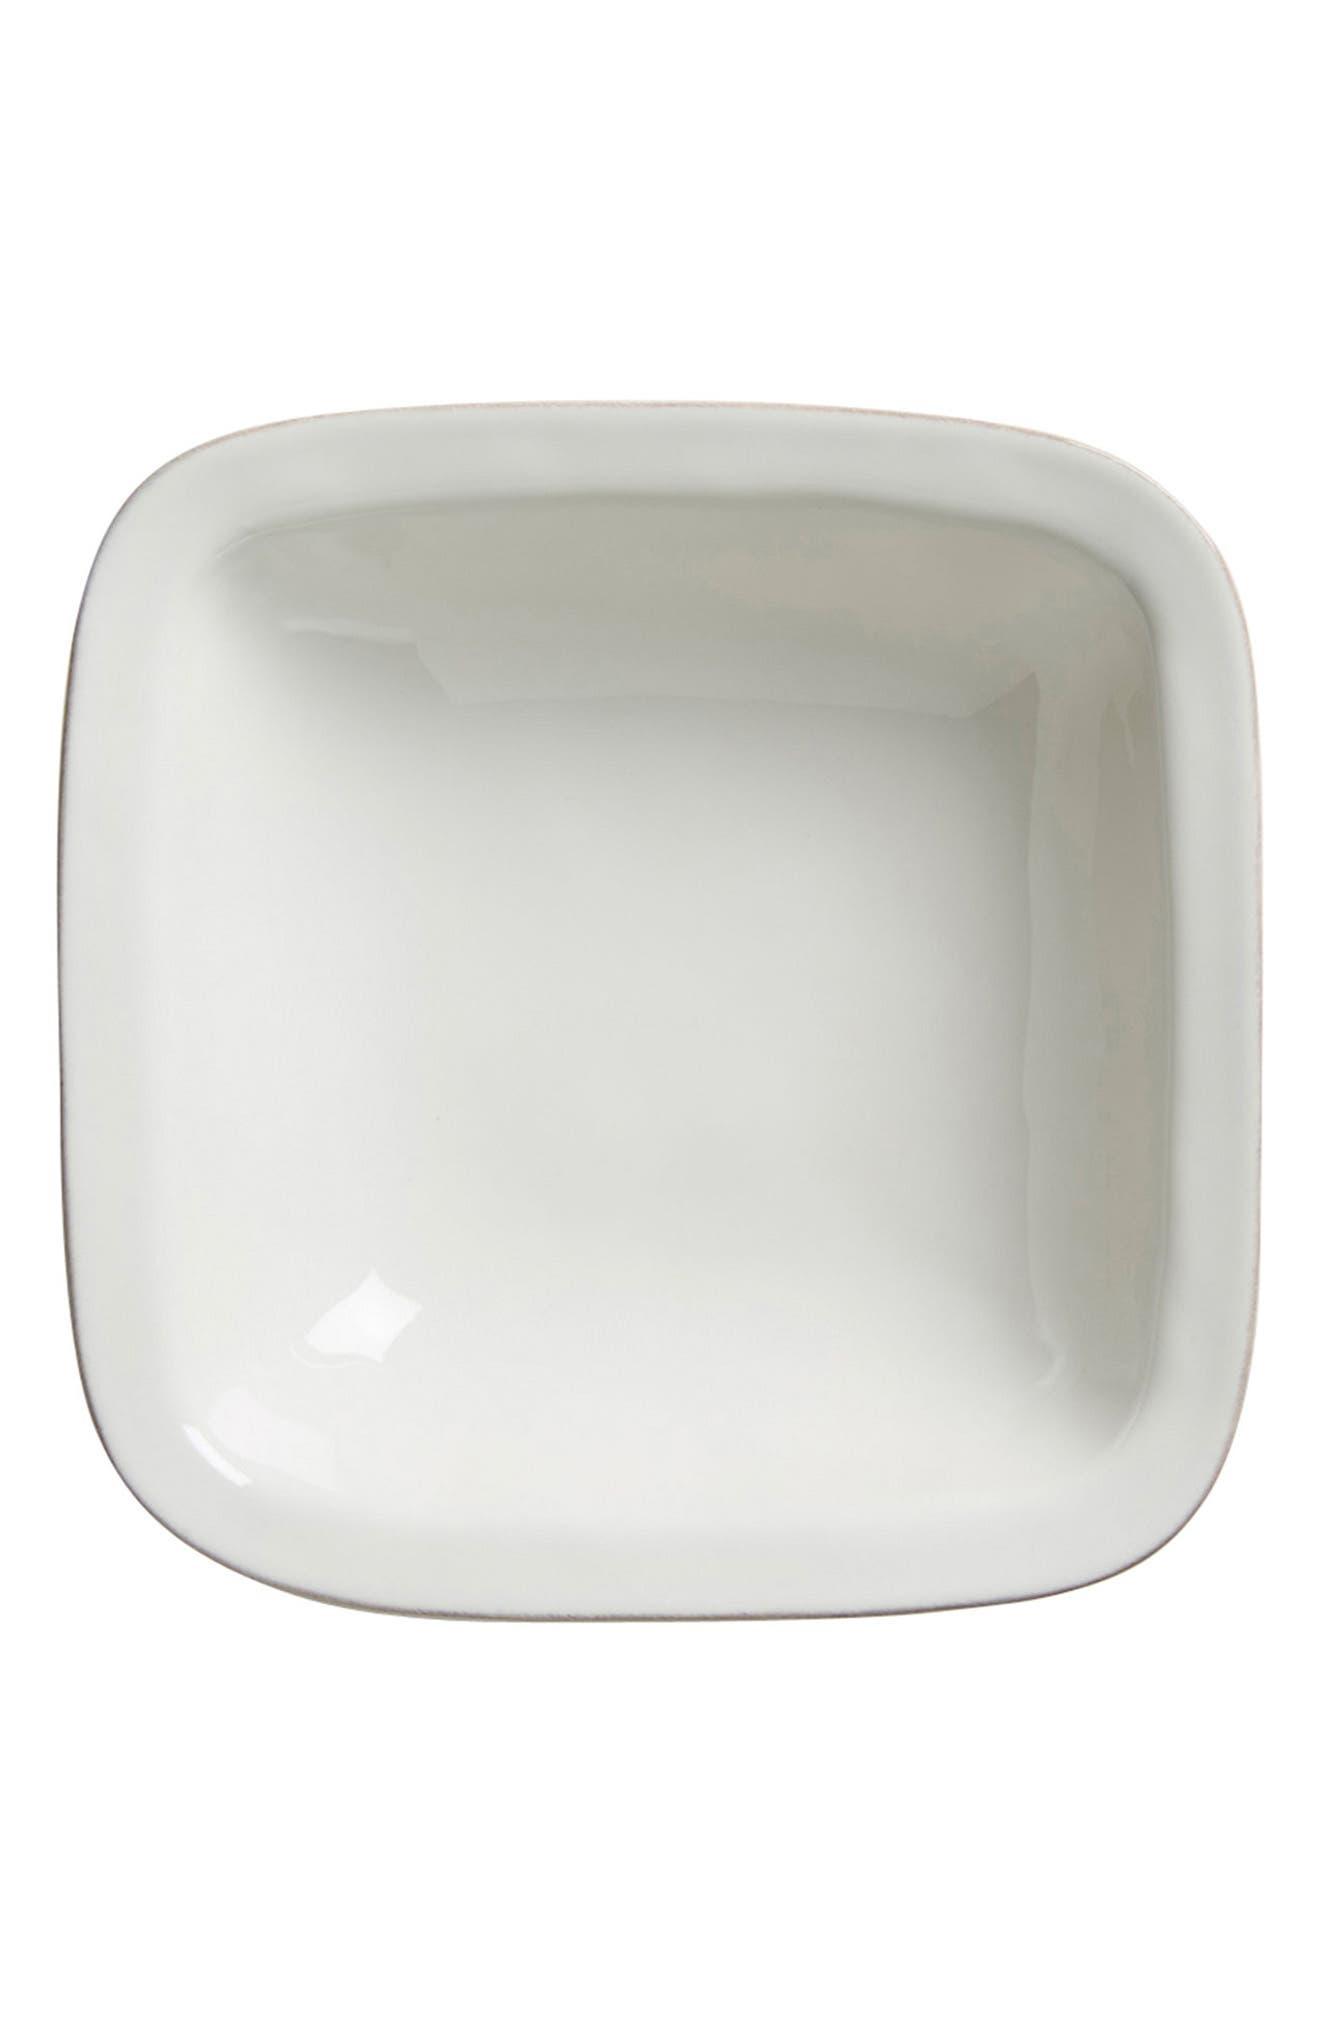 Main Image - Juliska Puro Ceramic Serving Bowl